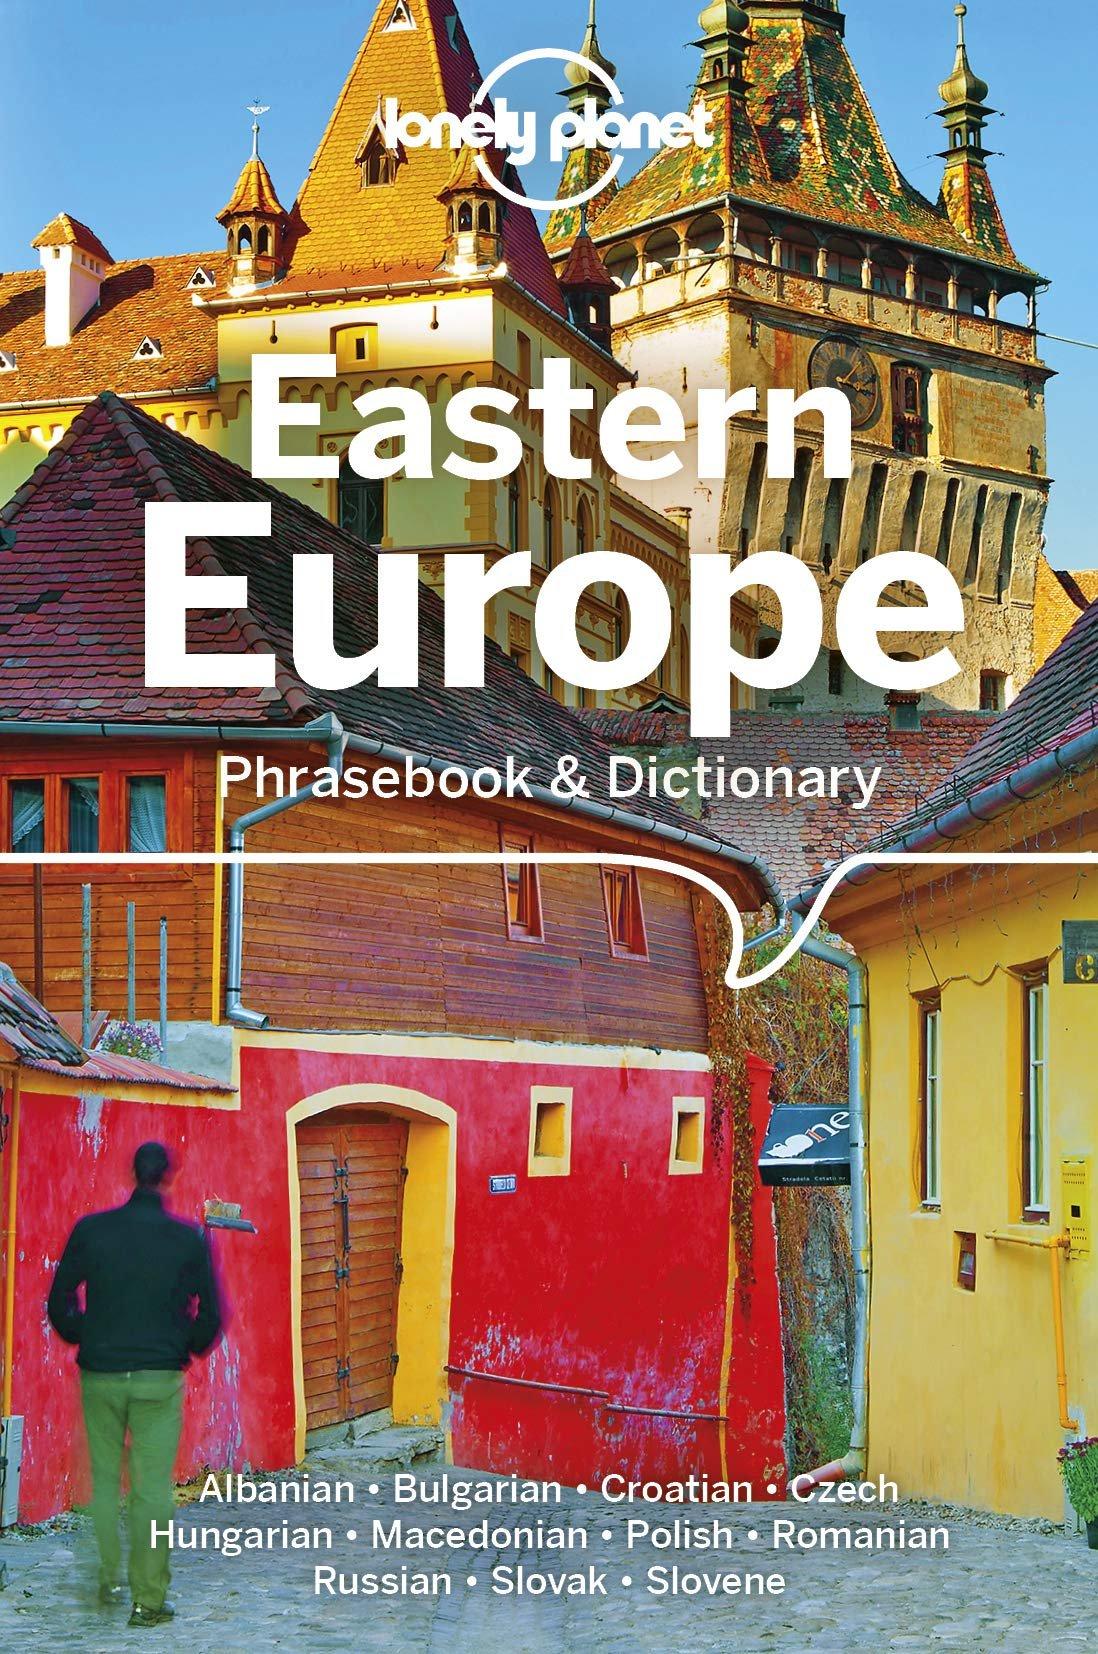 Eastern Europe Lonely Planet phrasebook 9781786572844  Lonely Planet Phrasebooks  Taalgidsen en Woordenboeken Centraal- en Oost-Europa, Balkan, Siberië